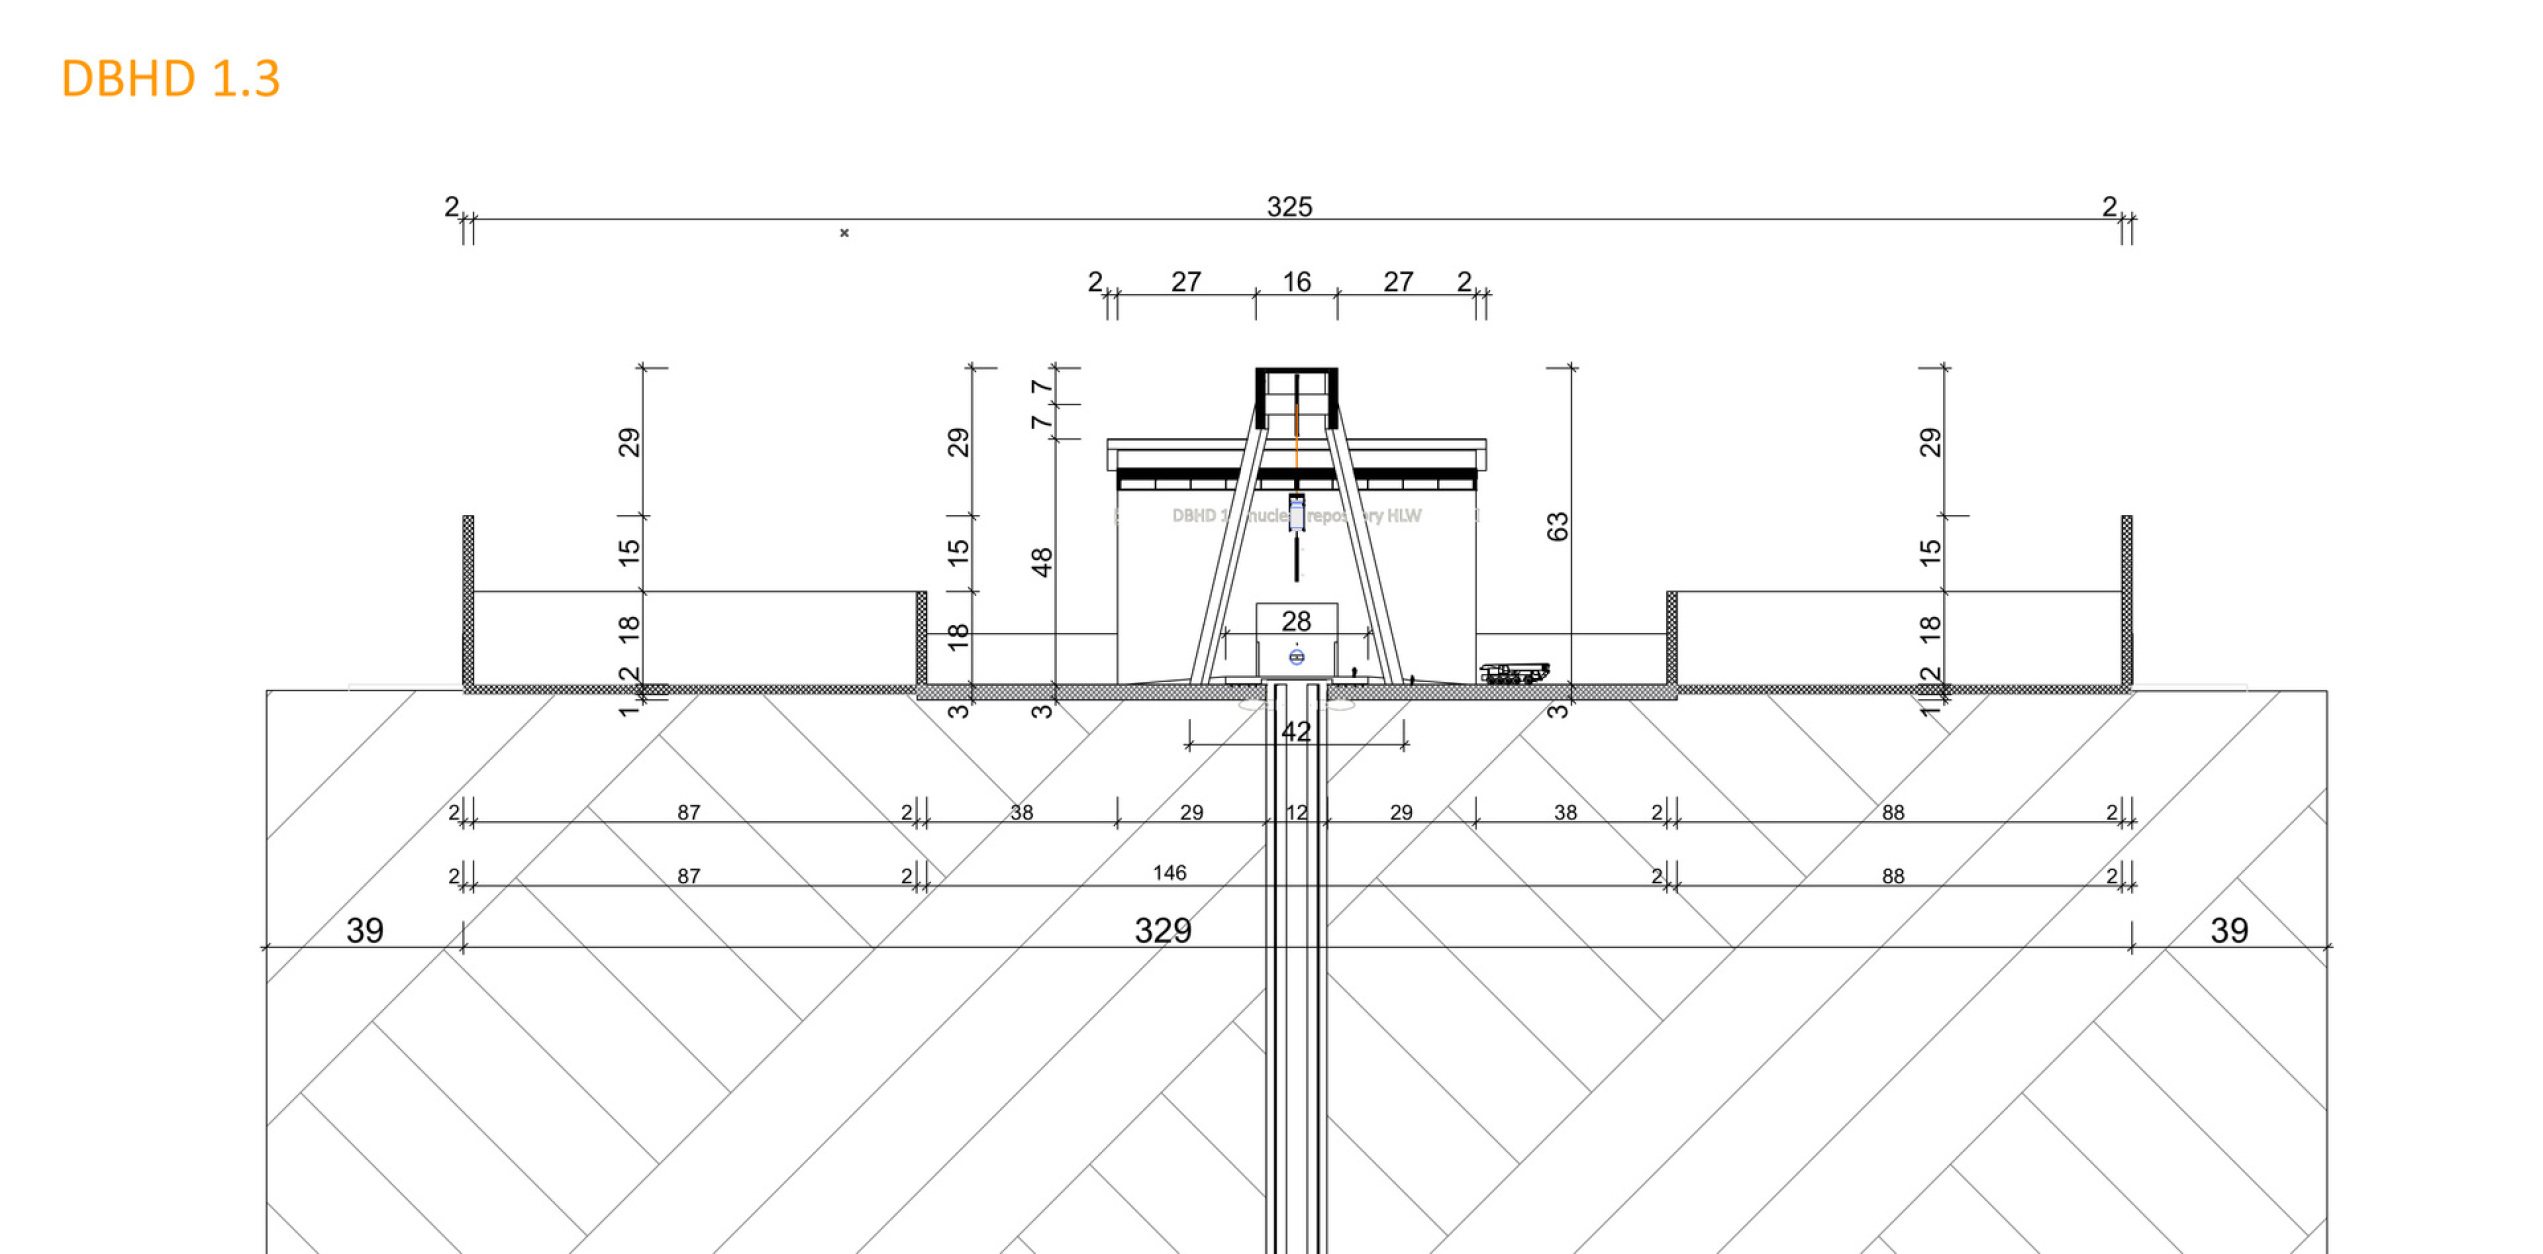 DBHD_1.3_Schnitt_Cut_Surface_Oberfläche_Endlager_M-V